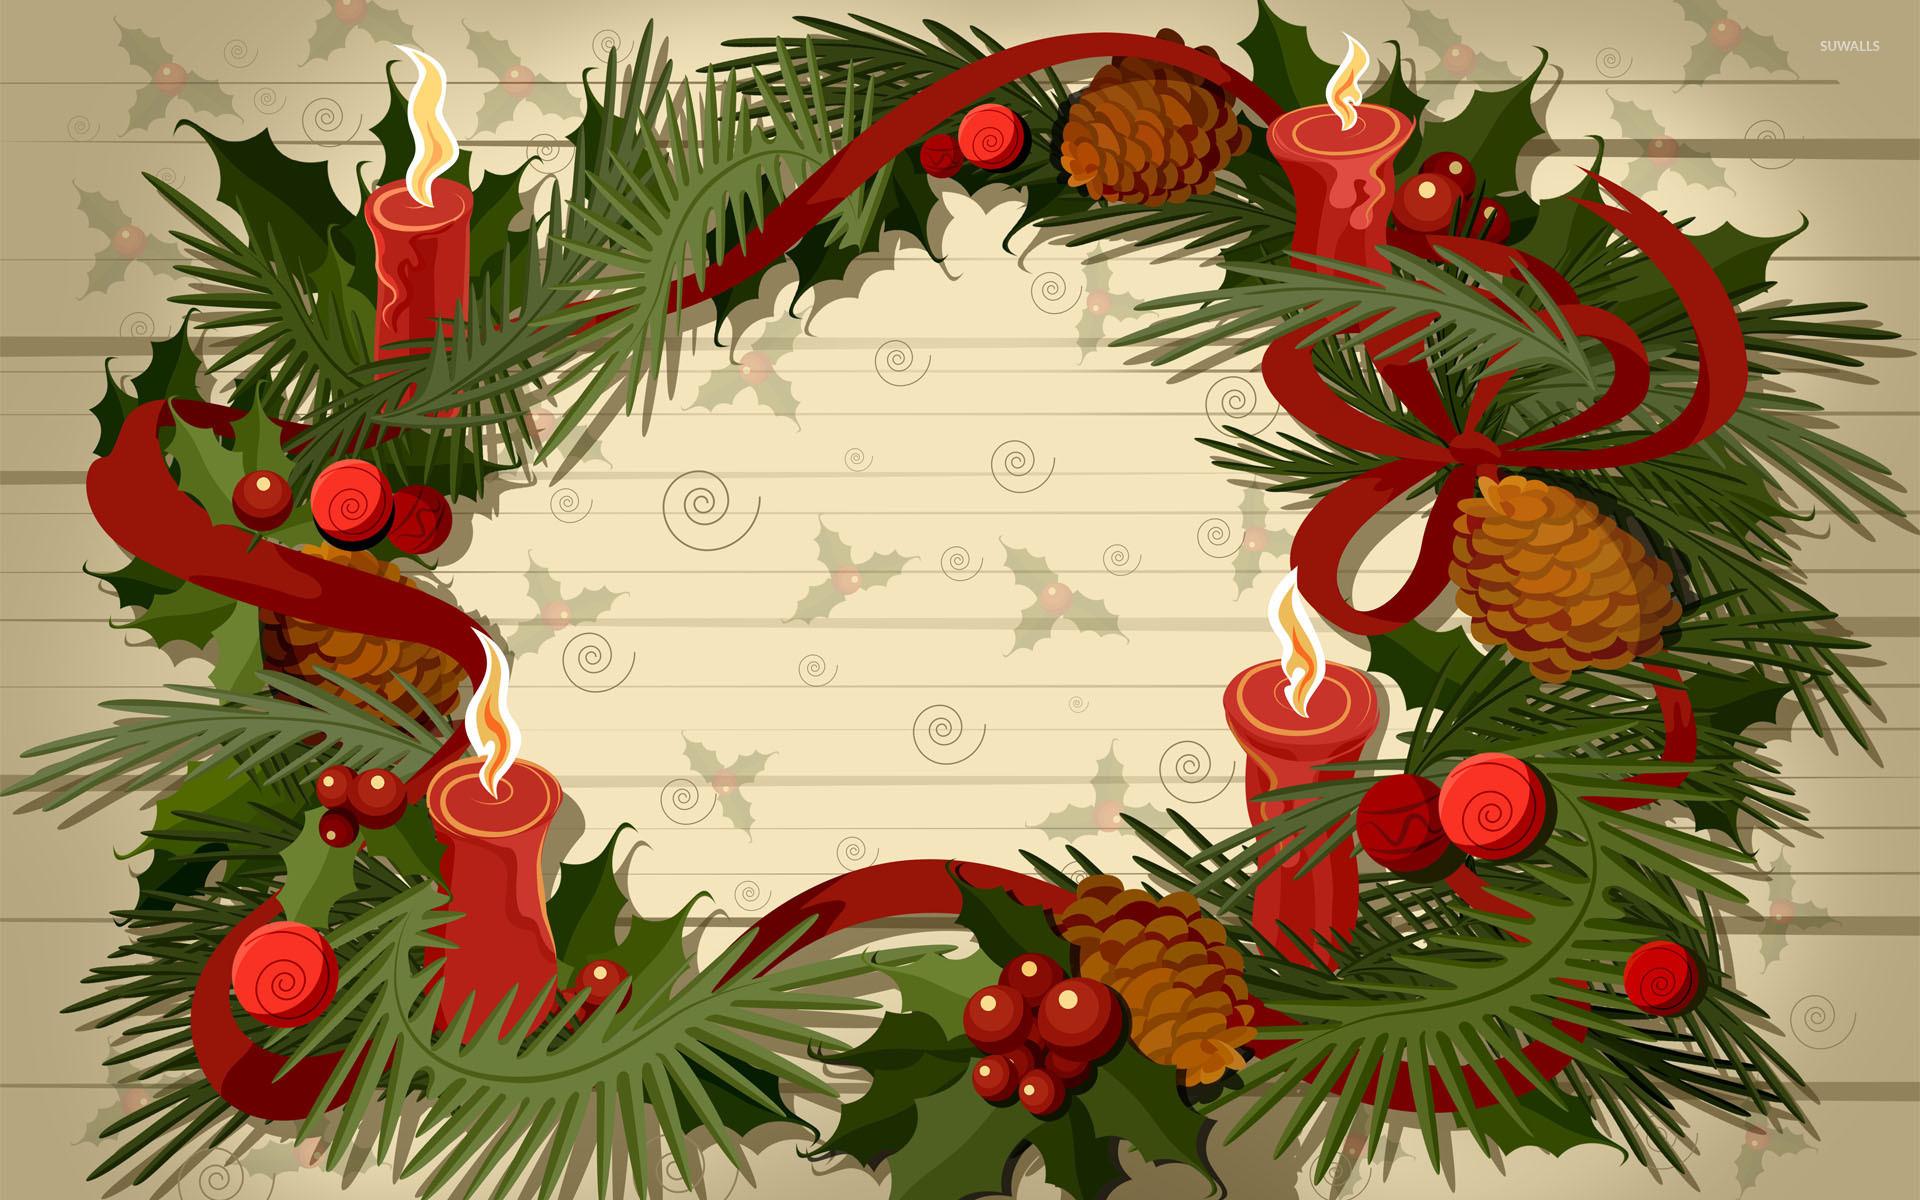 Advent wreath wallpaper